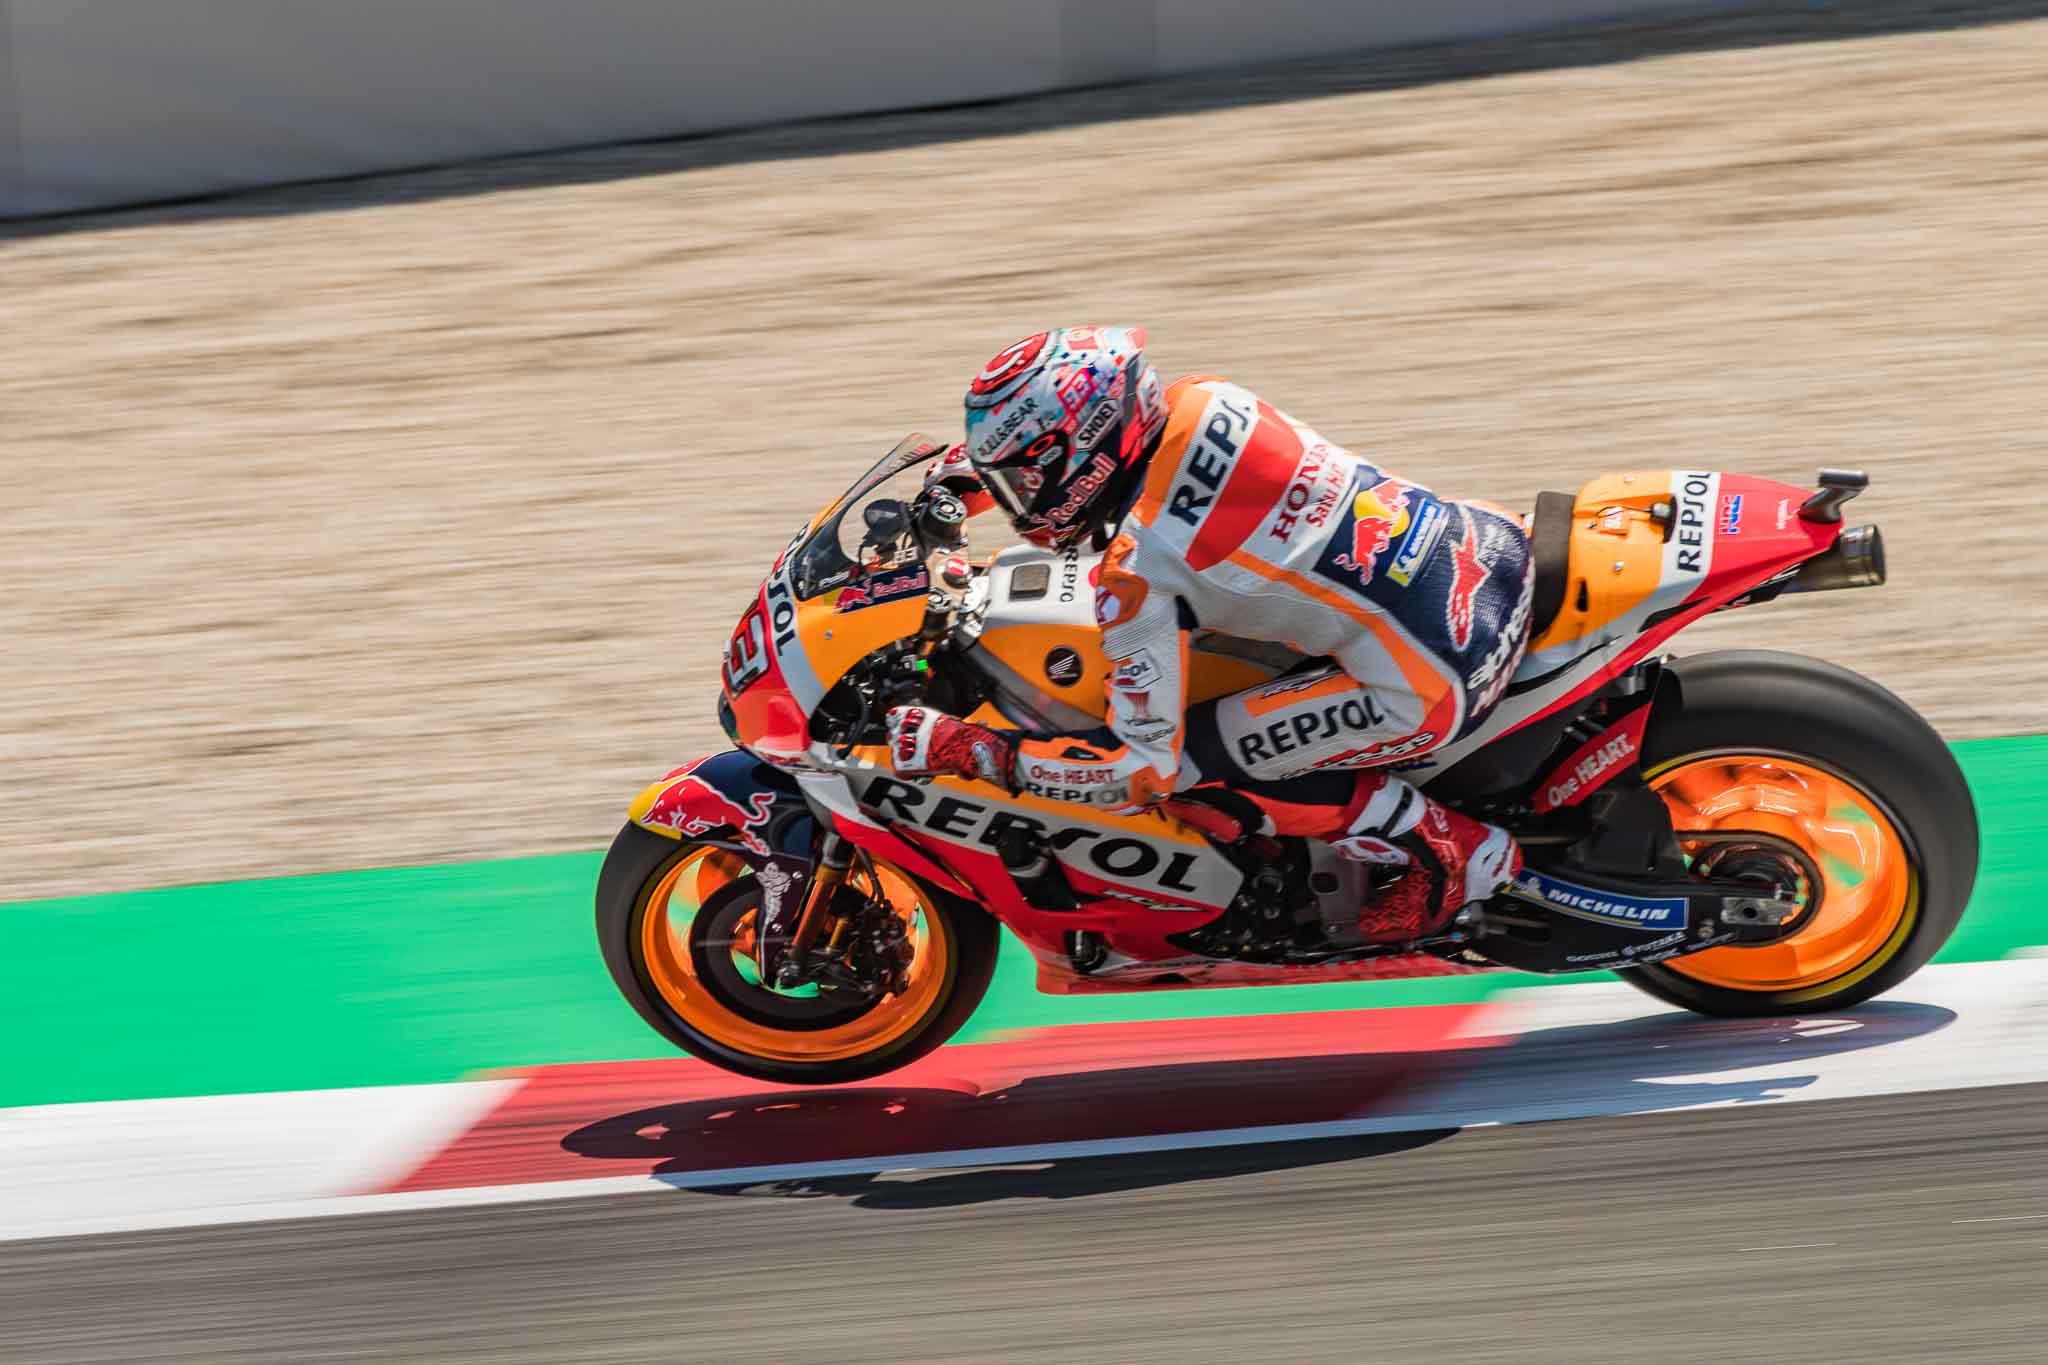 Motos 2018 Circuit Barcelona Catalunya